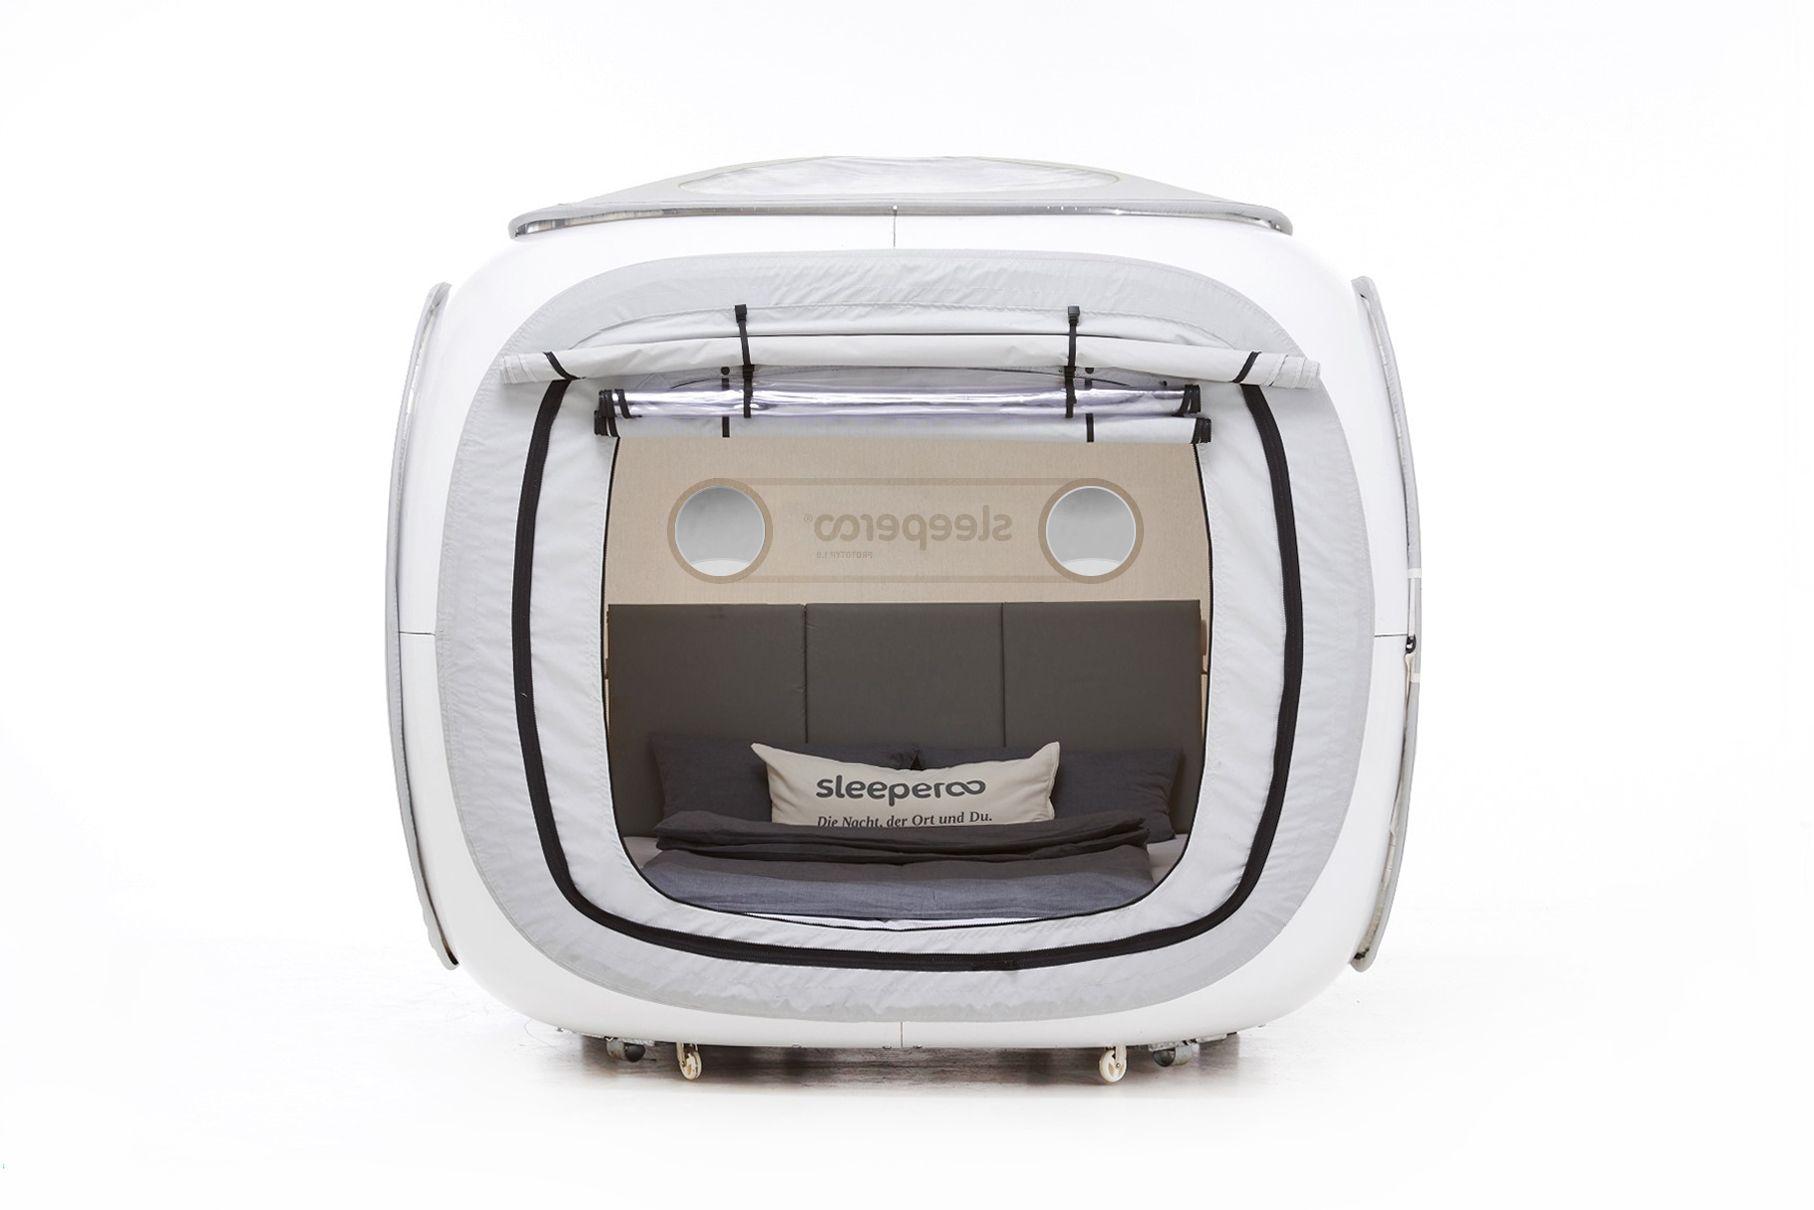 Design_Sleeperoo-compressor